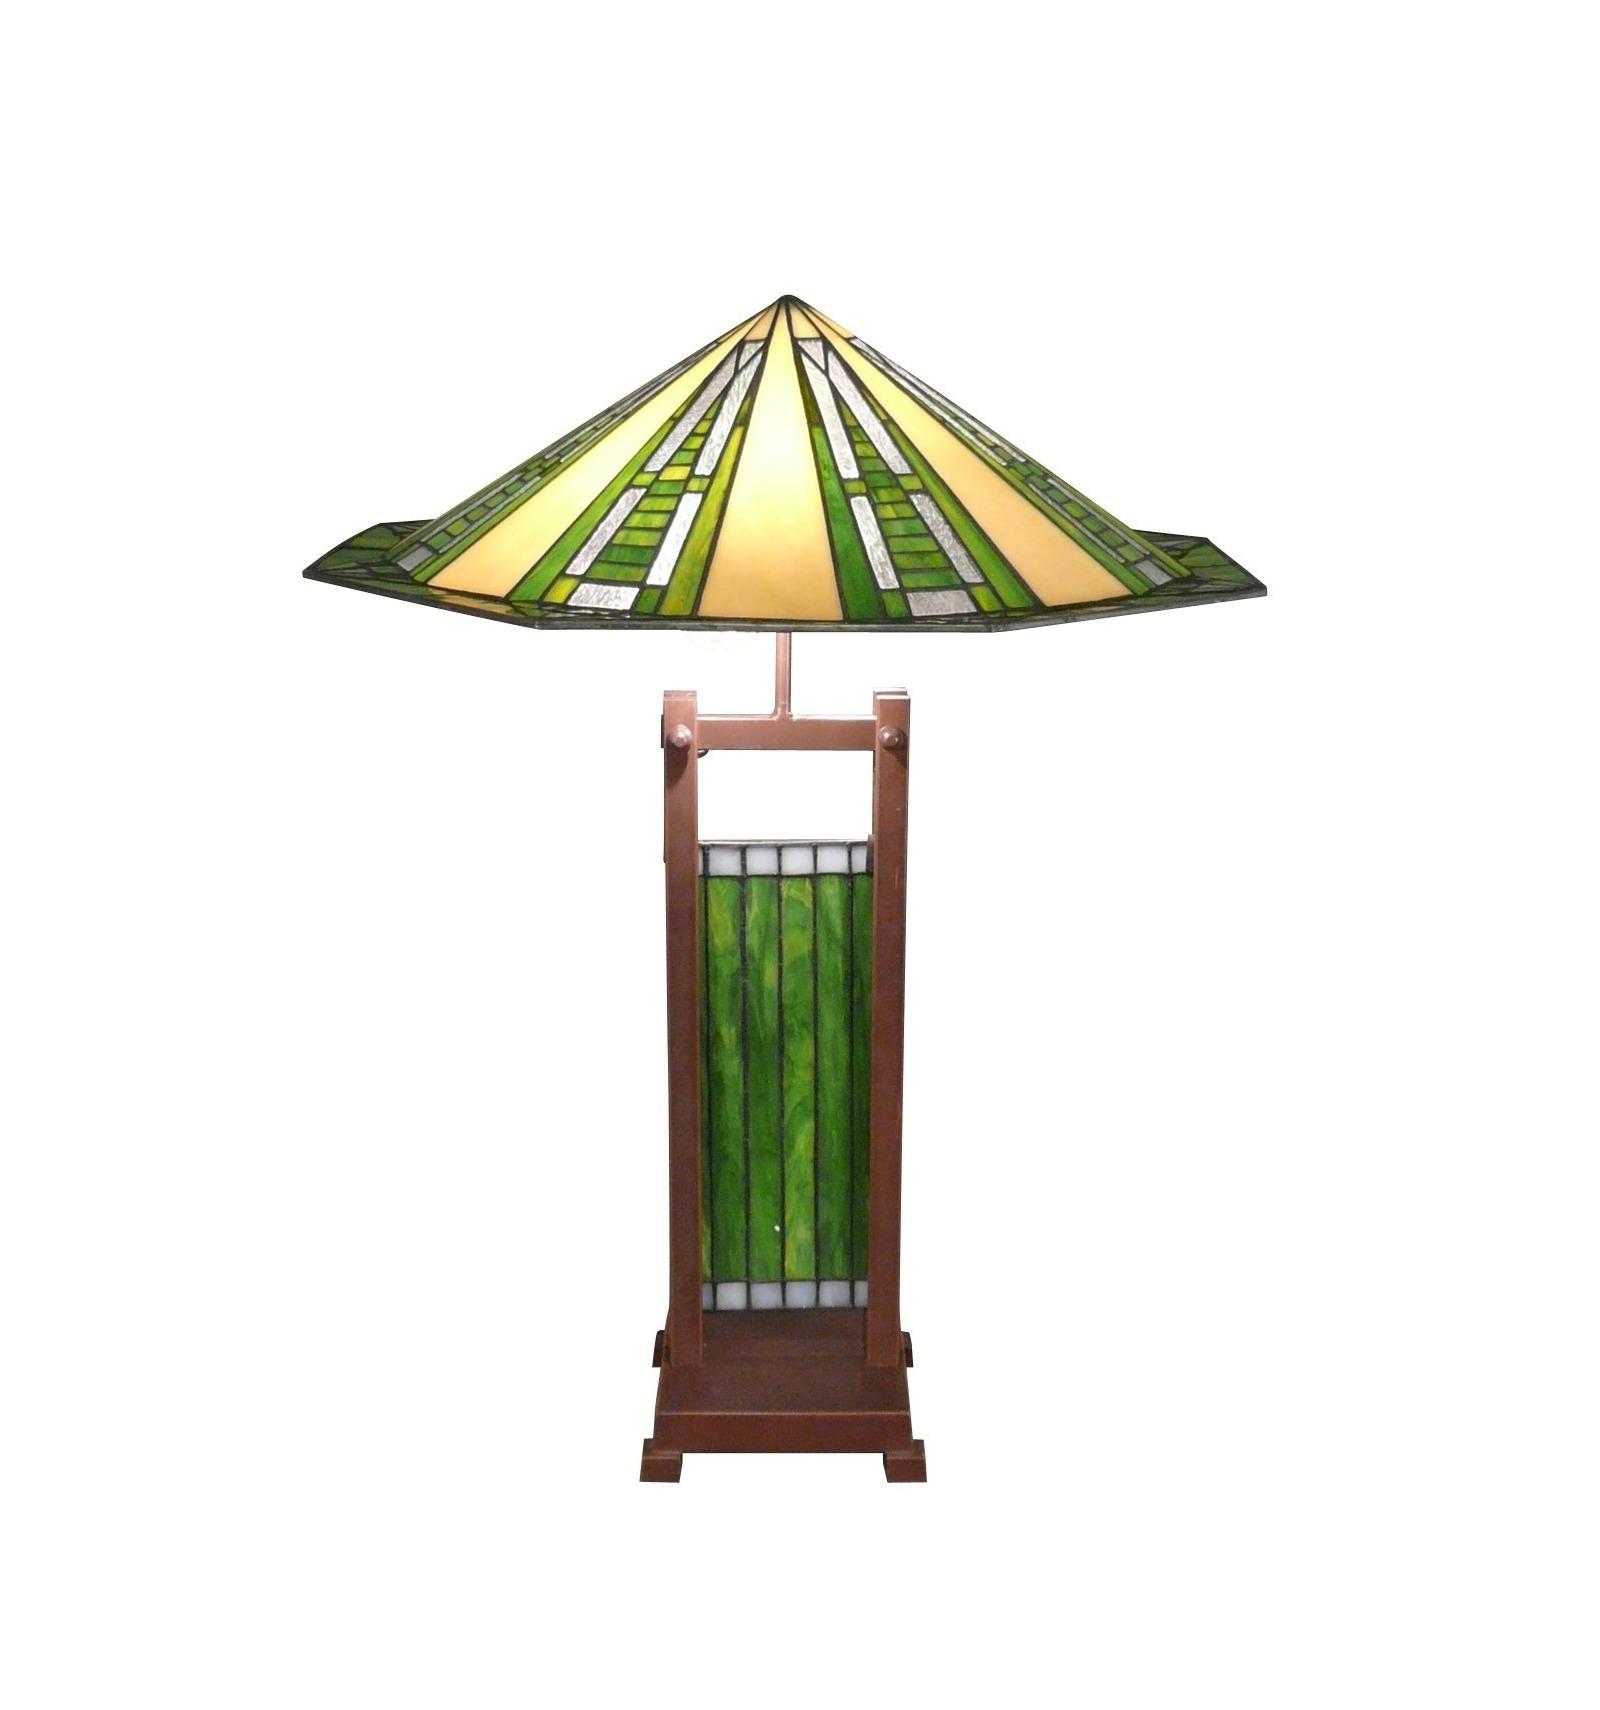 Lampe tiffany weihnachtsstern lampe tiffany lampe tiffany style art déco luminaire tiffany lampe tiffany